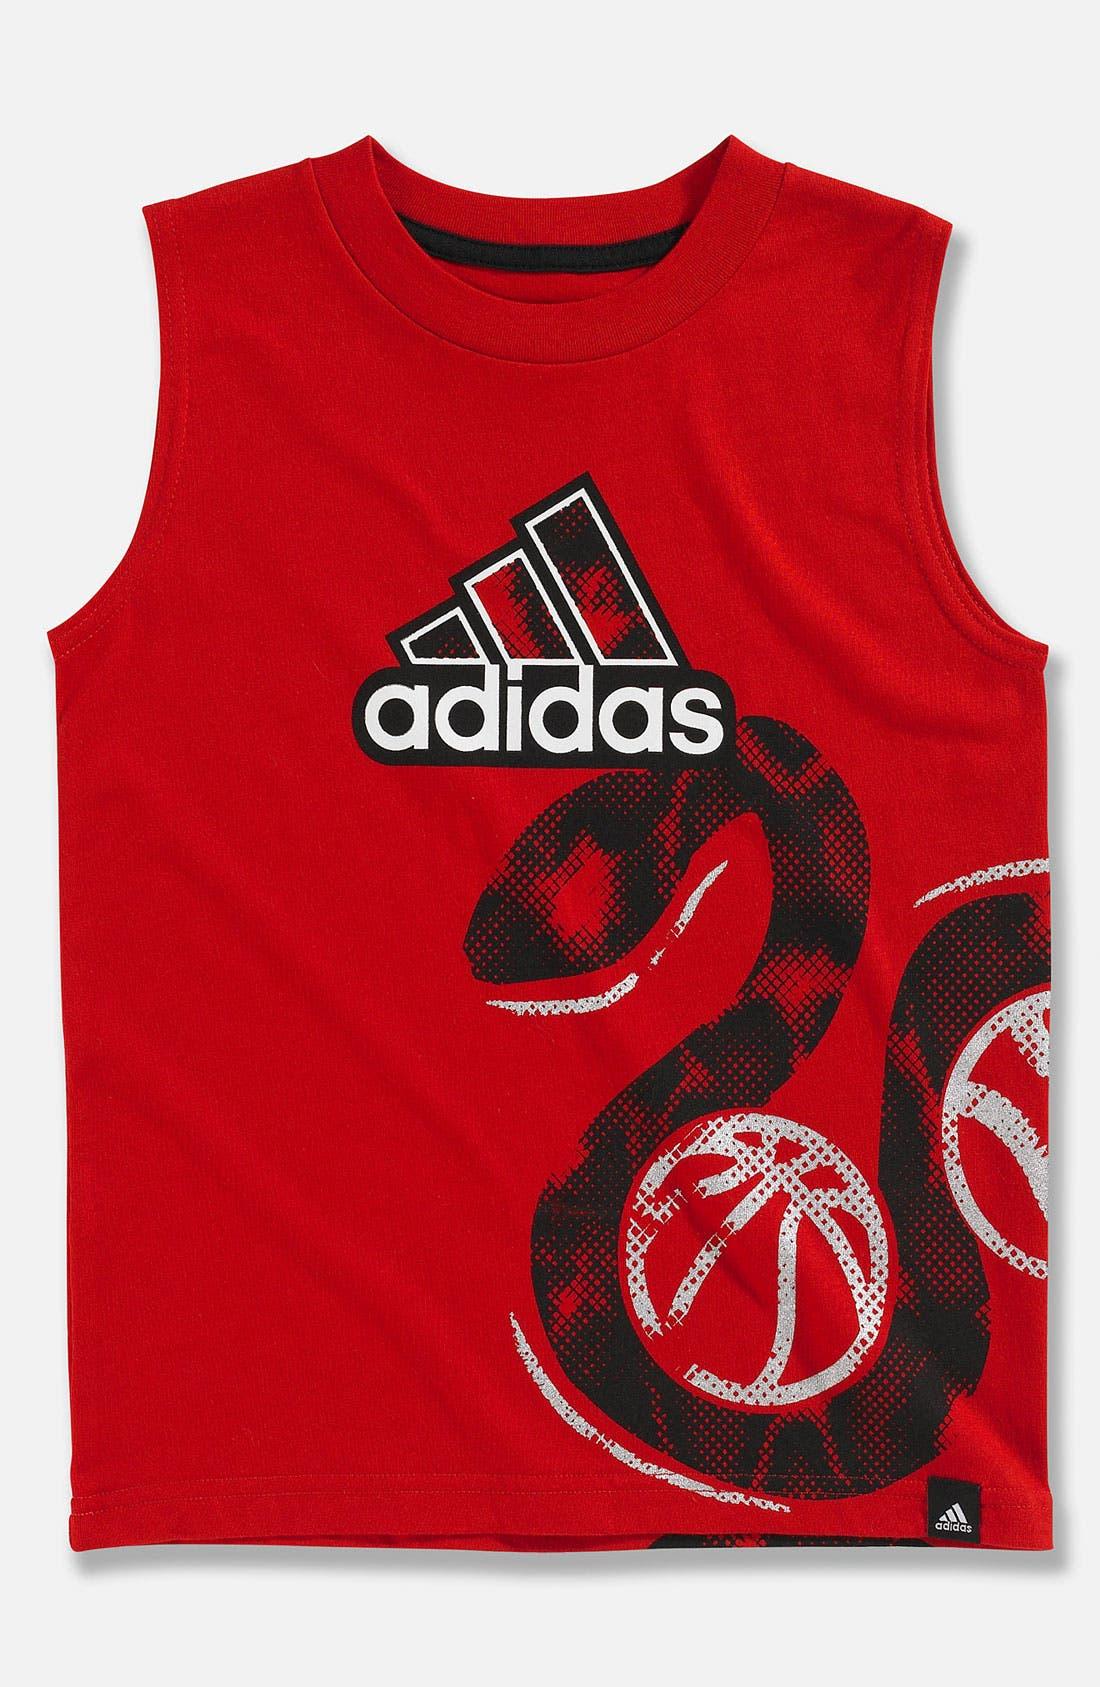 Alternate Image 1 Selected - adidas 'Big Baller' Tank Top (Little Boys)